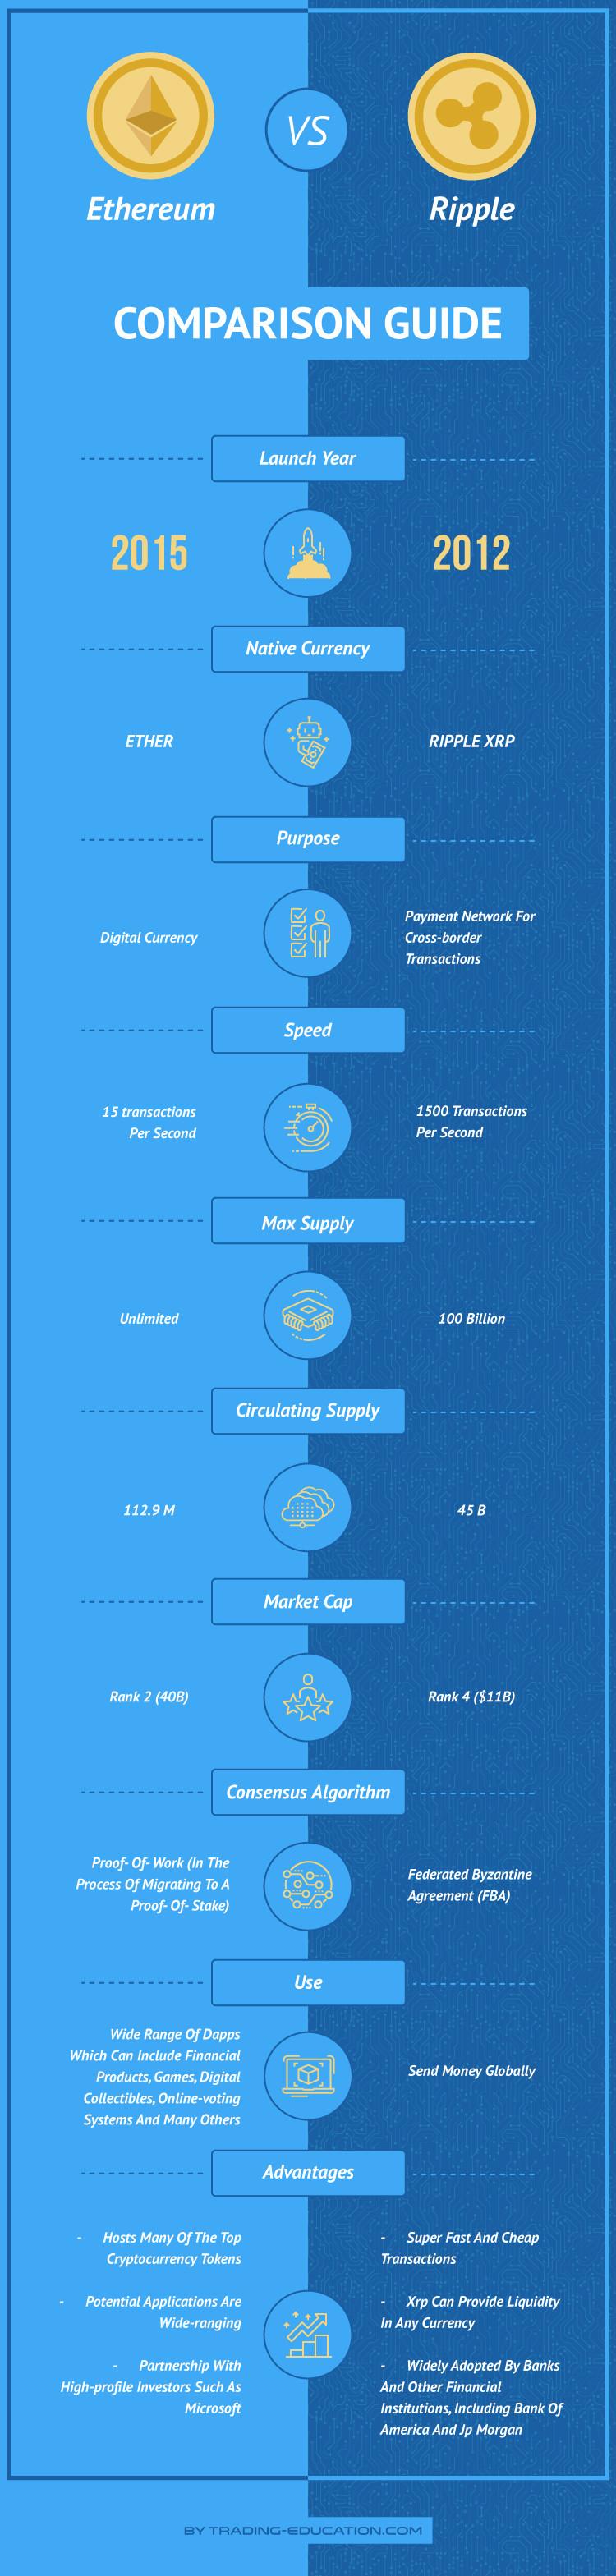 Ethereum vs Ripple infographic